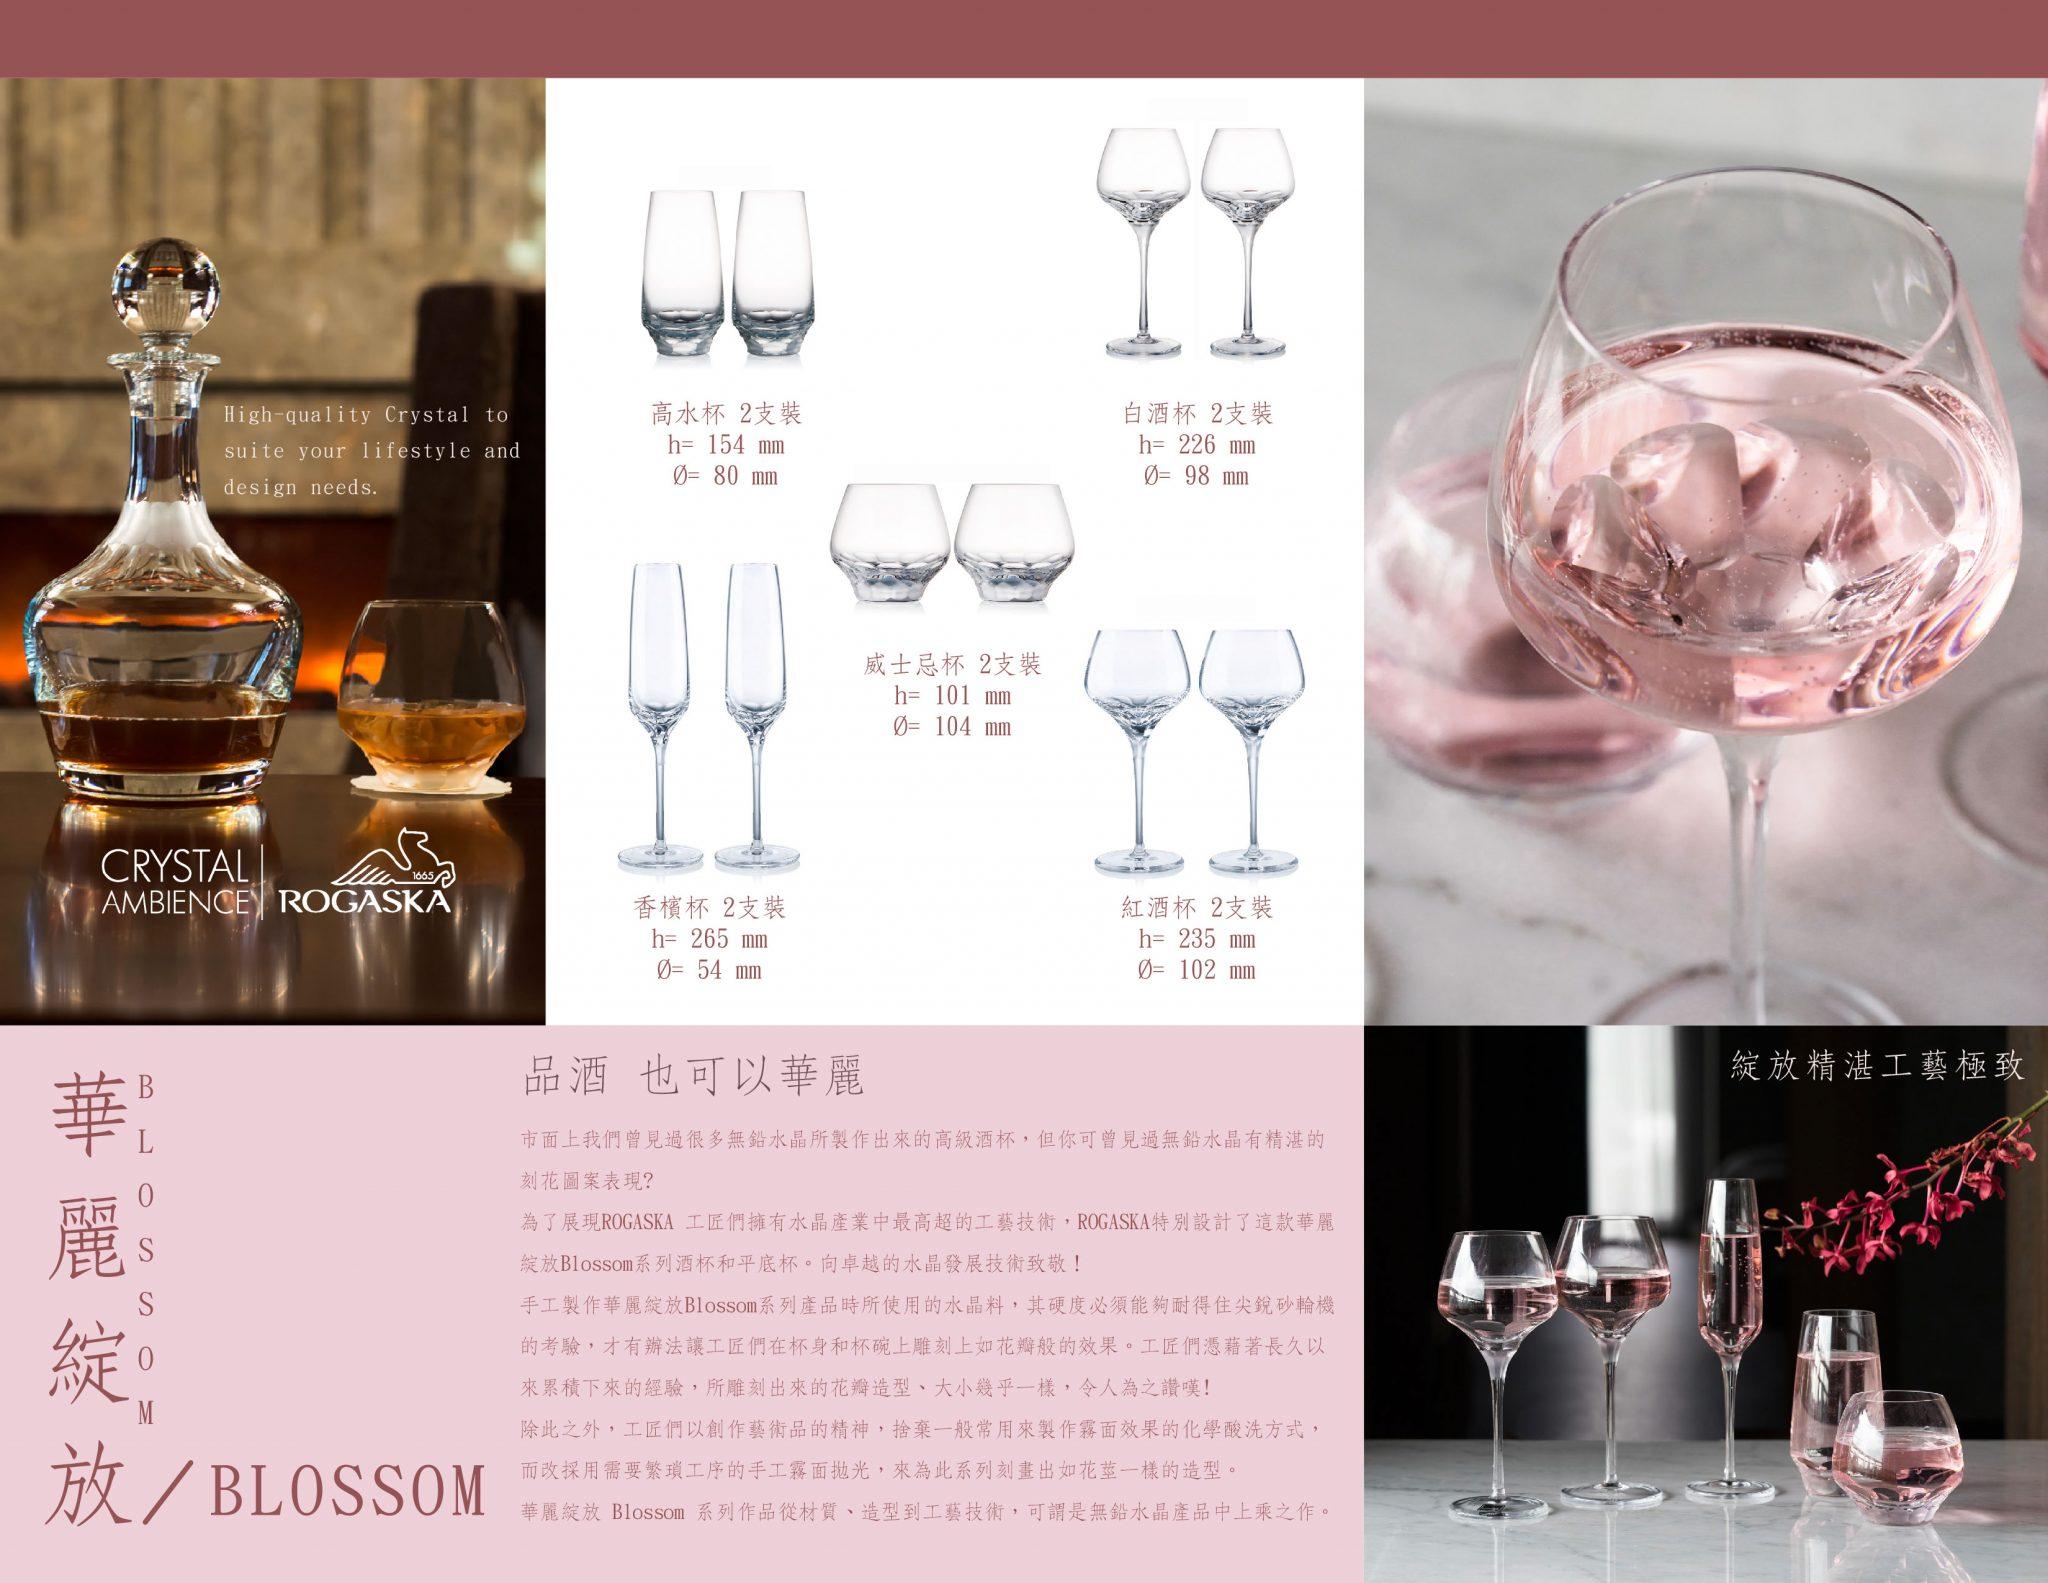 ROGASKA 水晶玻璃 BLOSSOM 華麗綻放 介紹